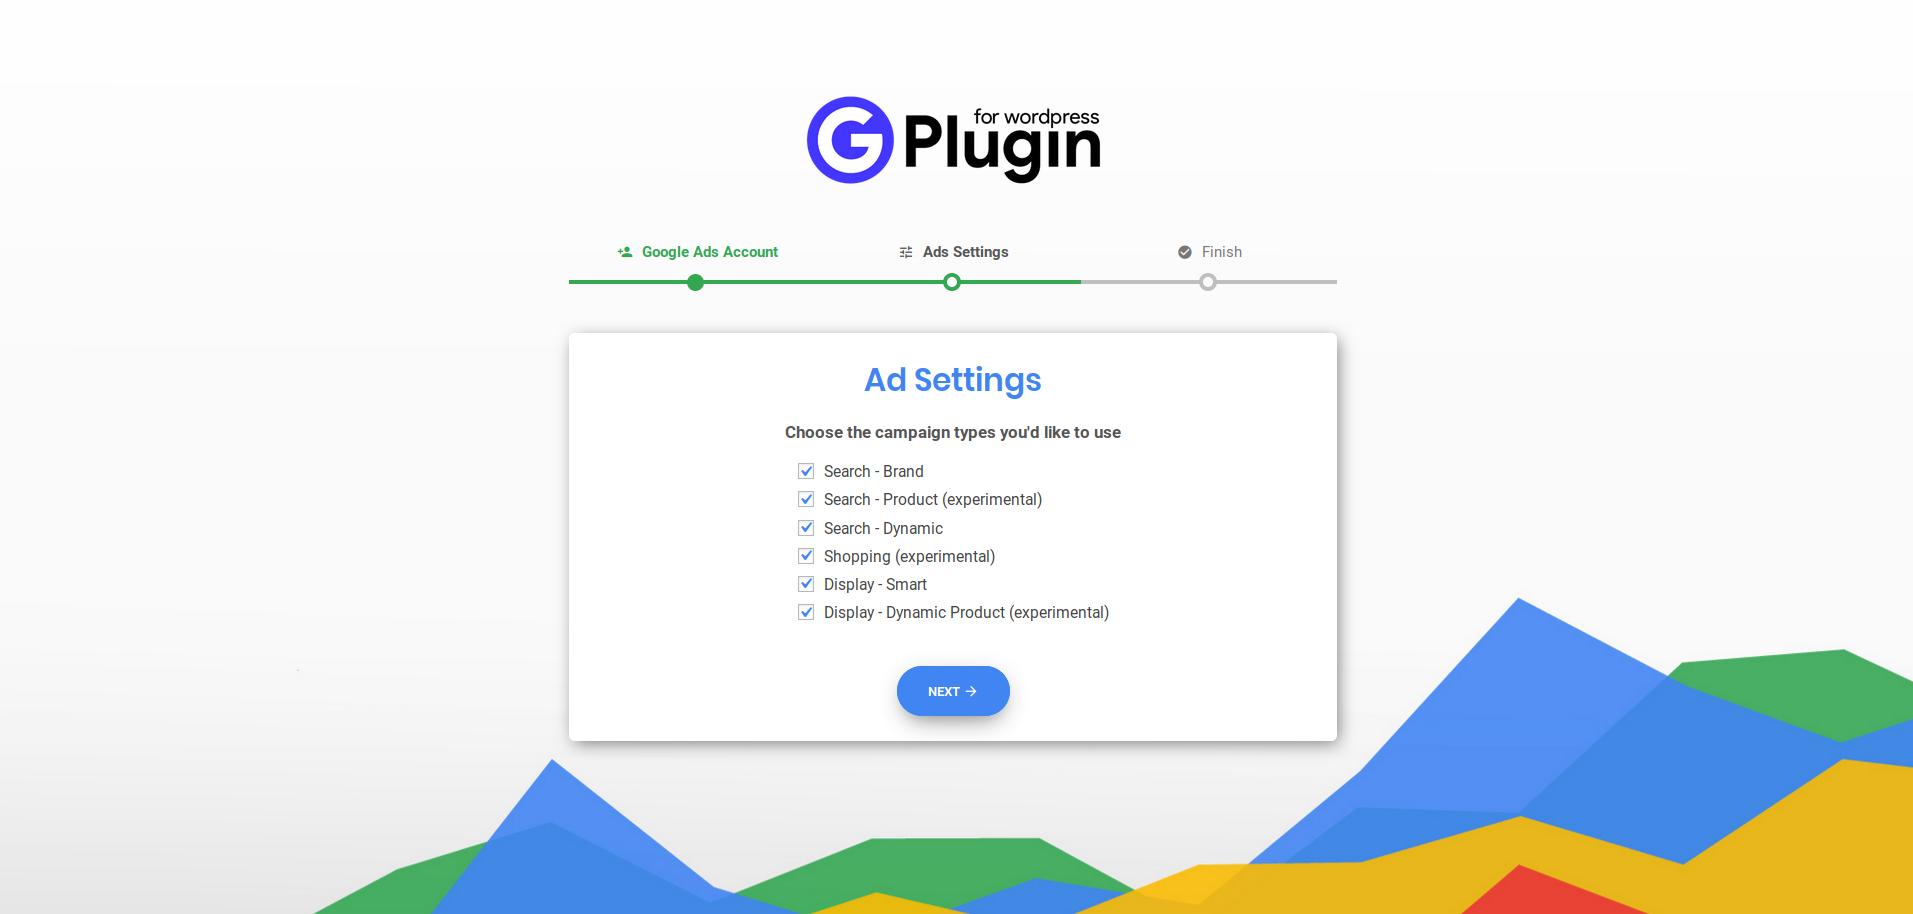 GPlugin: Google Ads for WordPress & WooCommerce